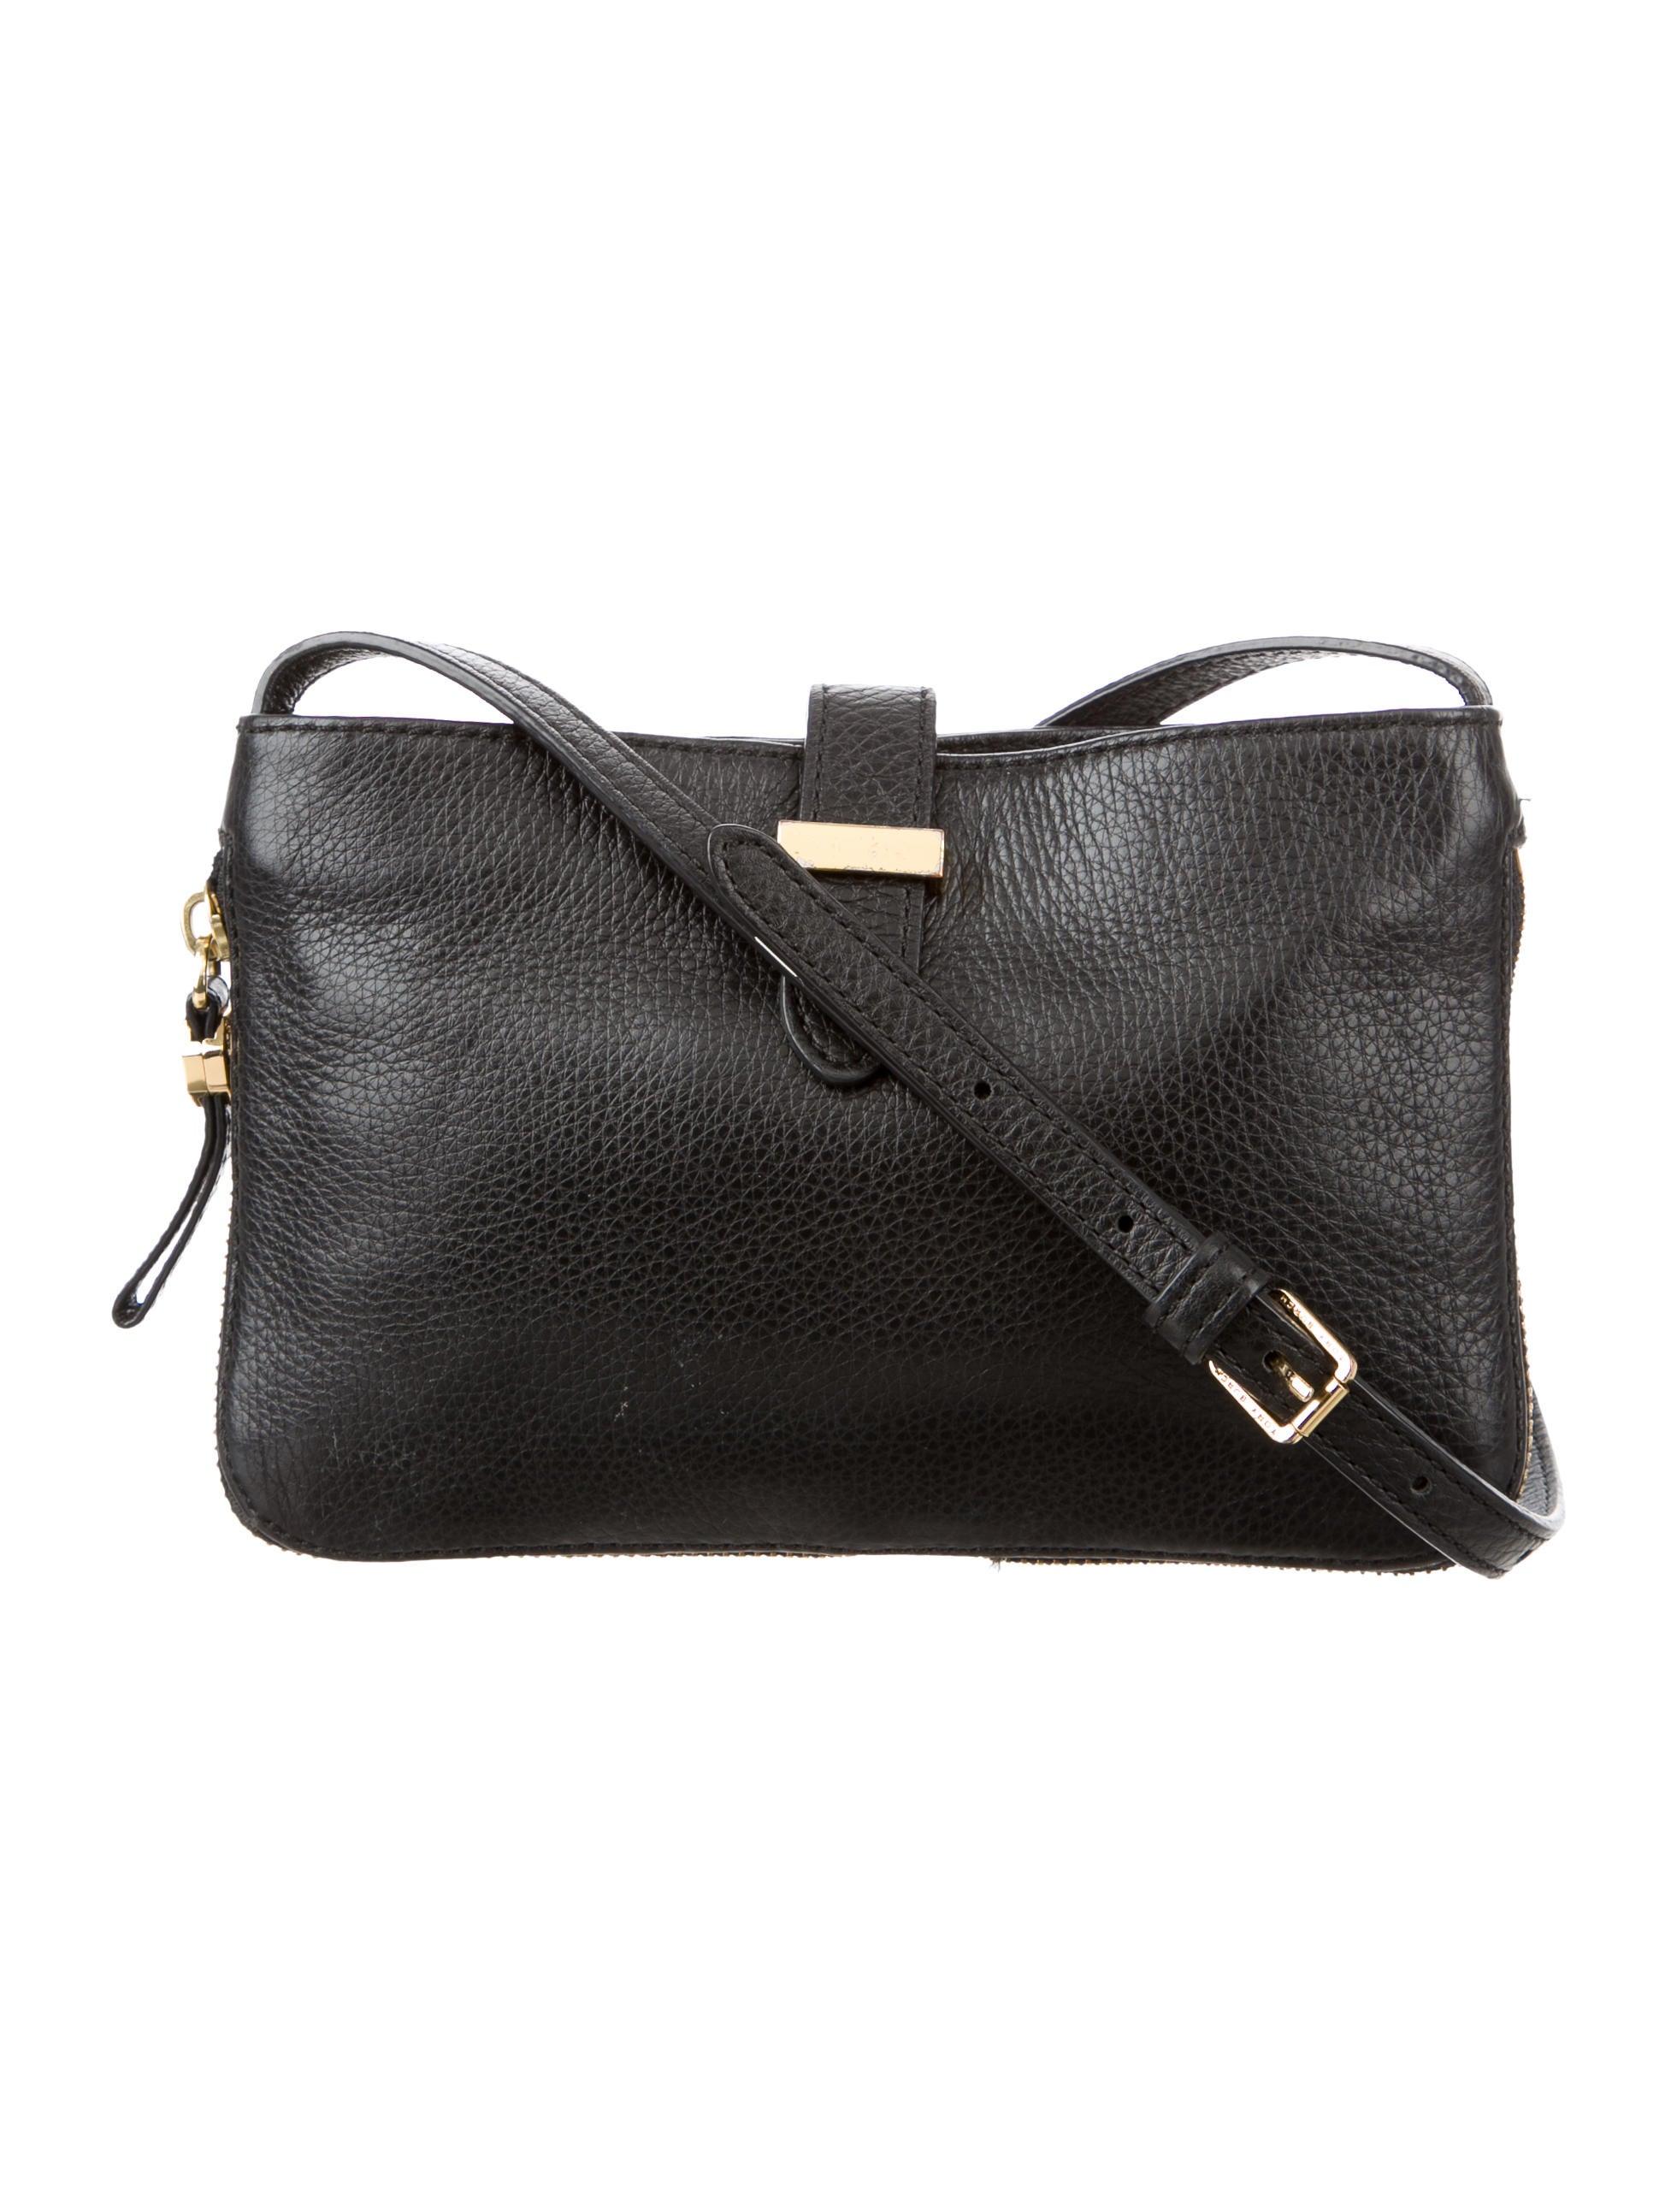 Black Pebbled Leather Crossbody Bag 17